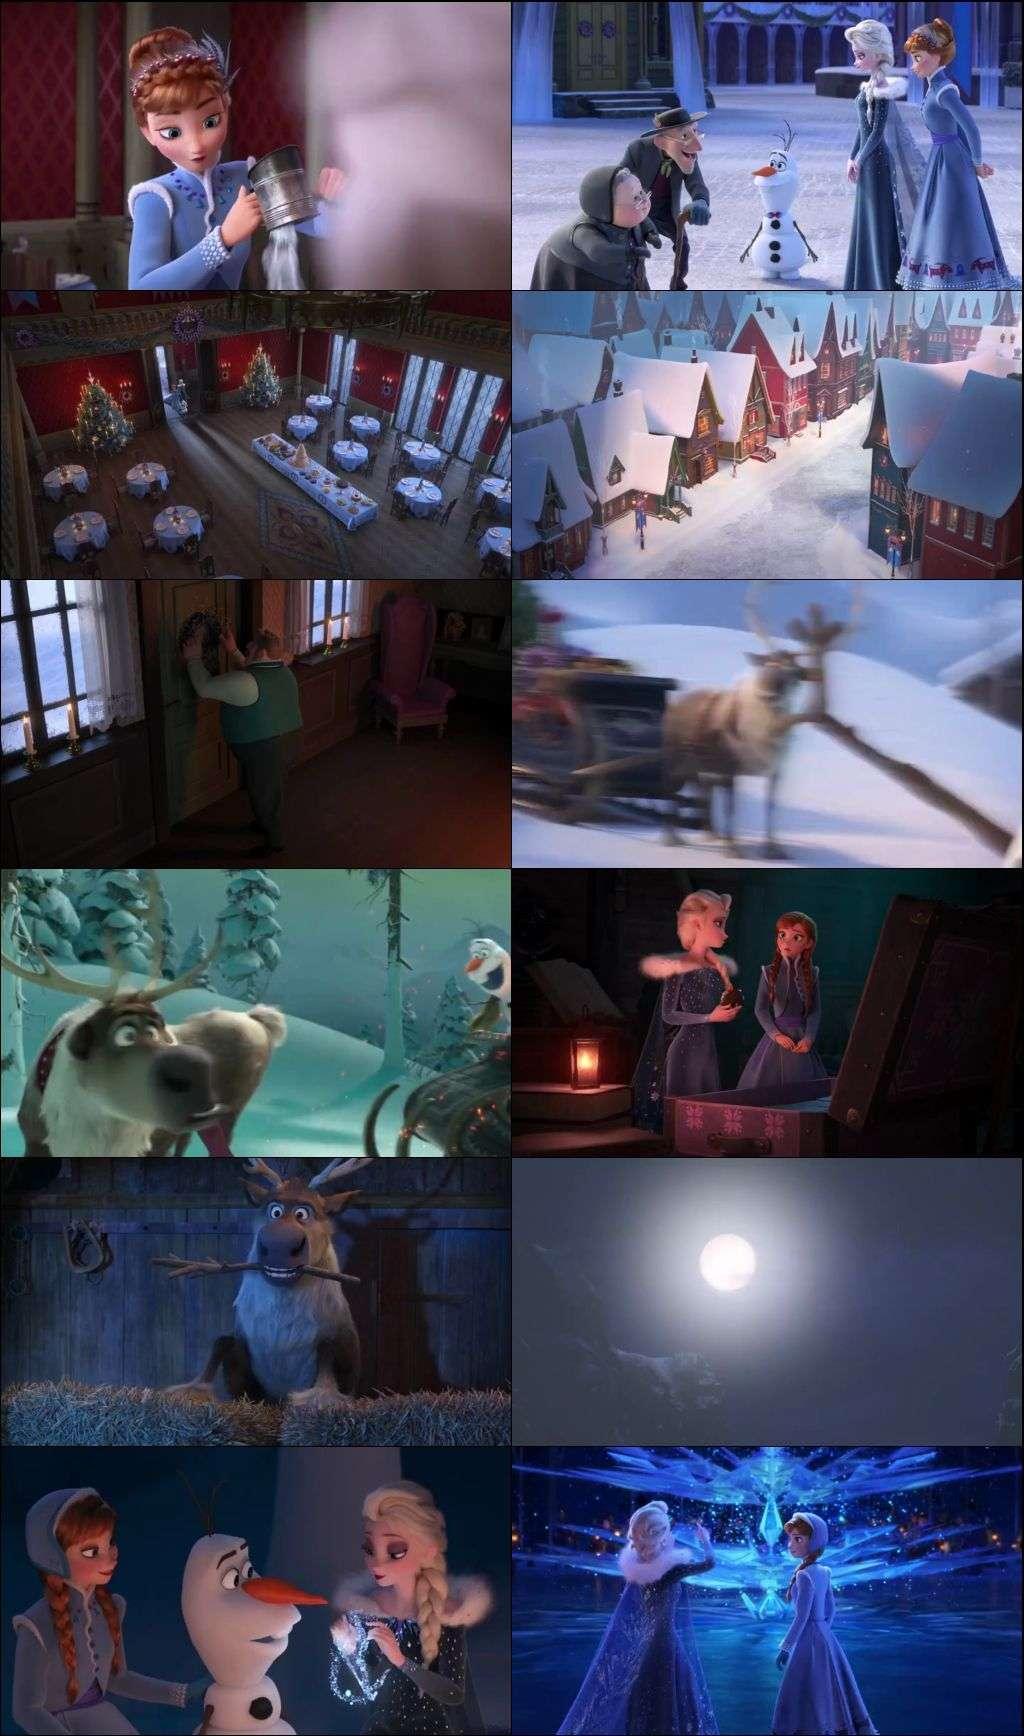 Olafs frozen adventure 2017 hdrip full movie mp4 hd olafs frozen adventure 2017 hdrip mp4 - Olaf s frozen adventure download ...